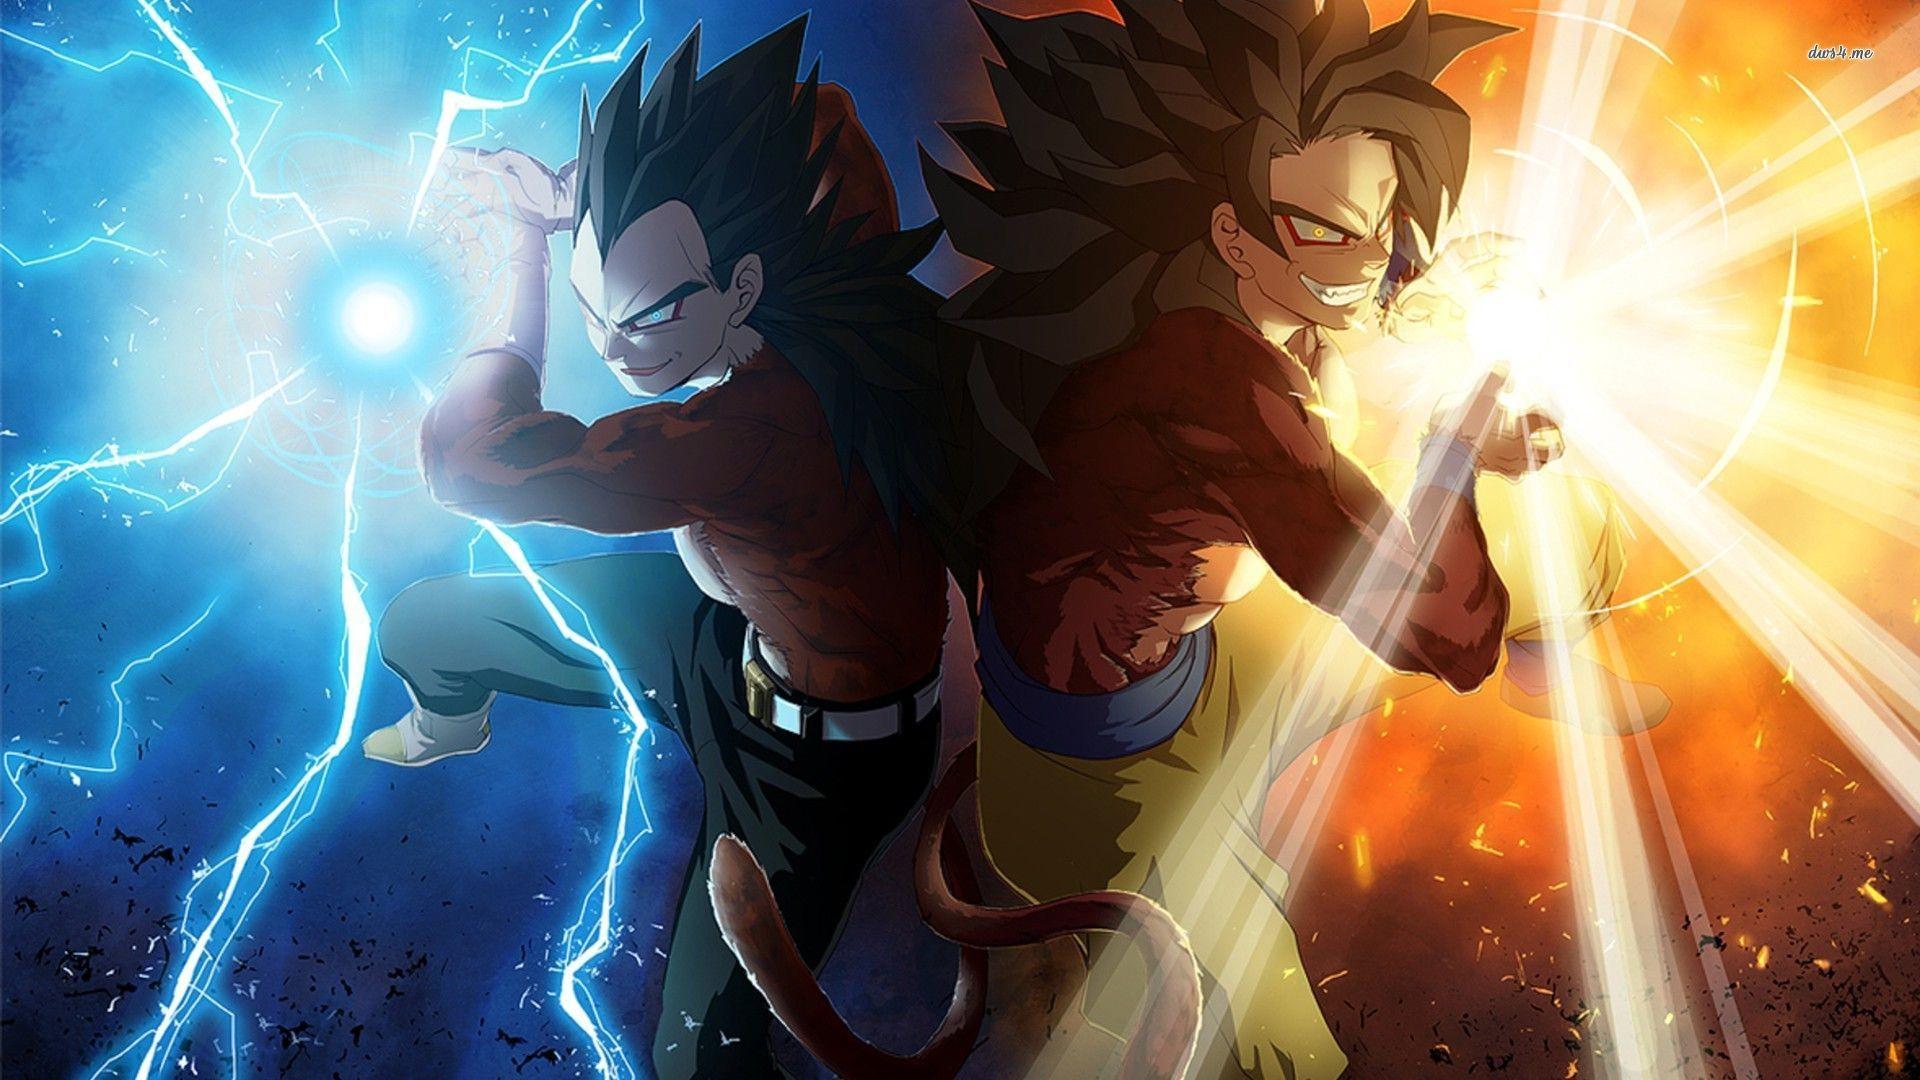 HD Super Saiyan 4 Vegeta and Goku Wallpaper Full HD Full Size .